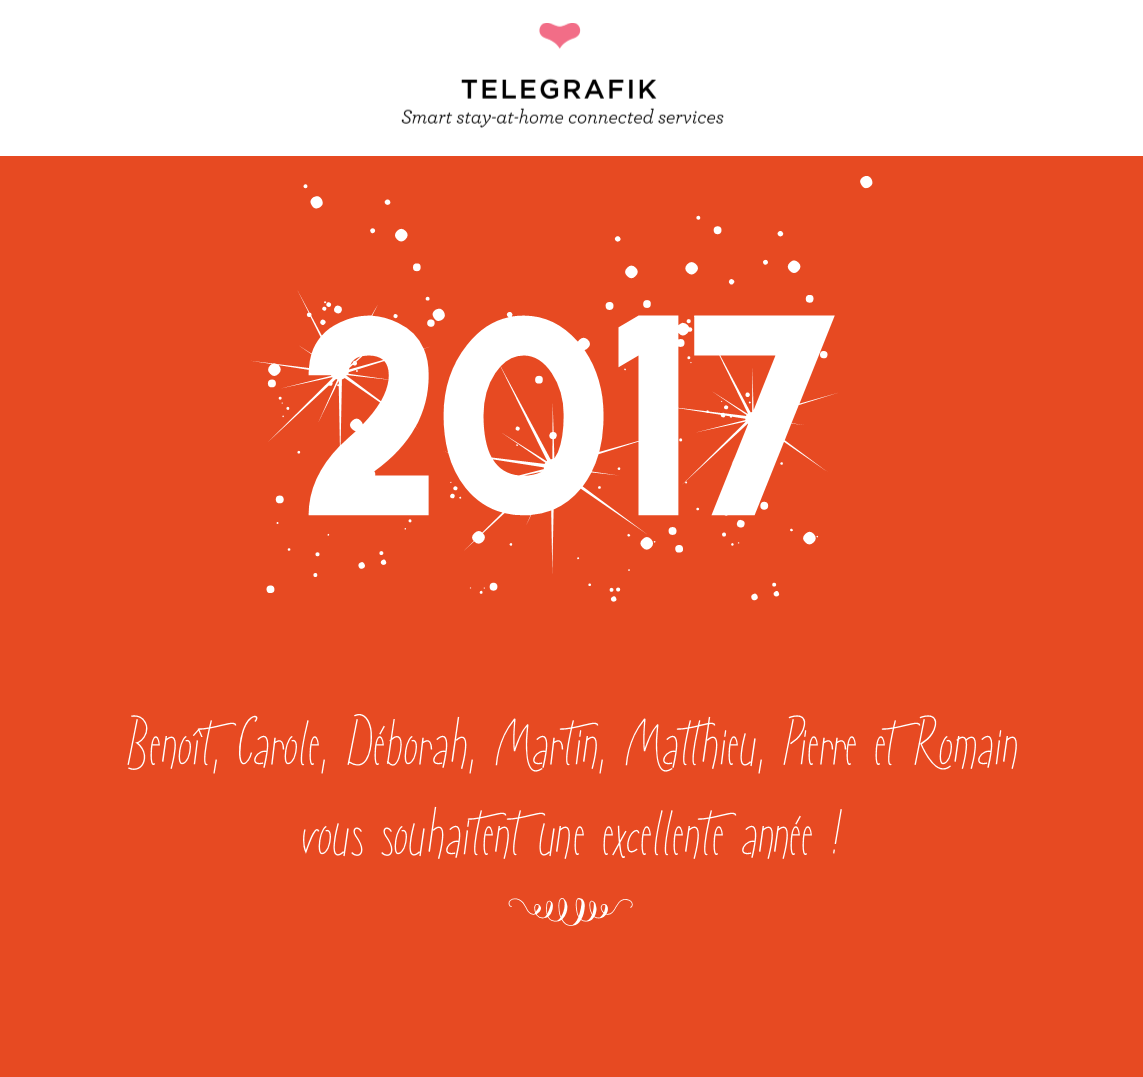 Bonnée année 2017 - TELEGRAFIK